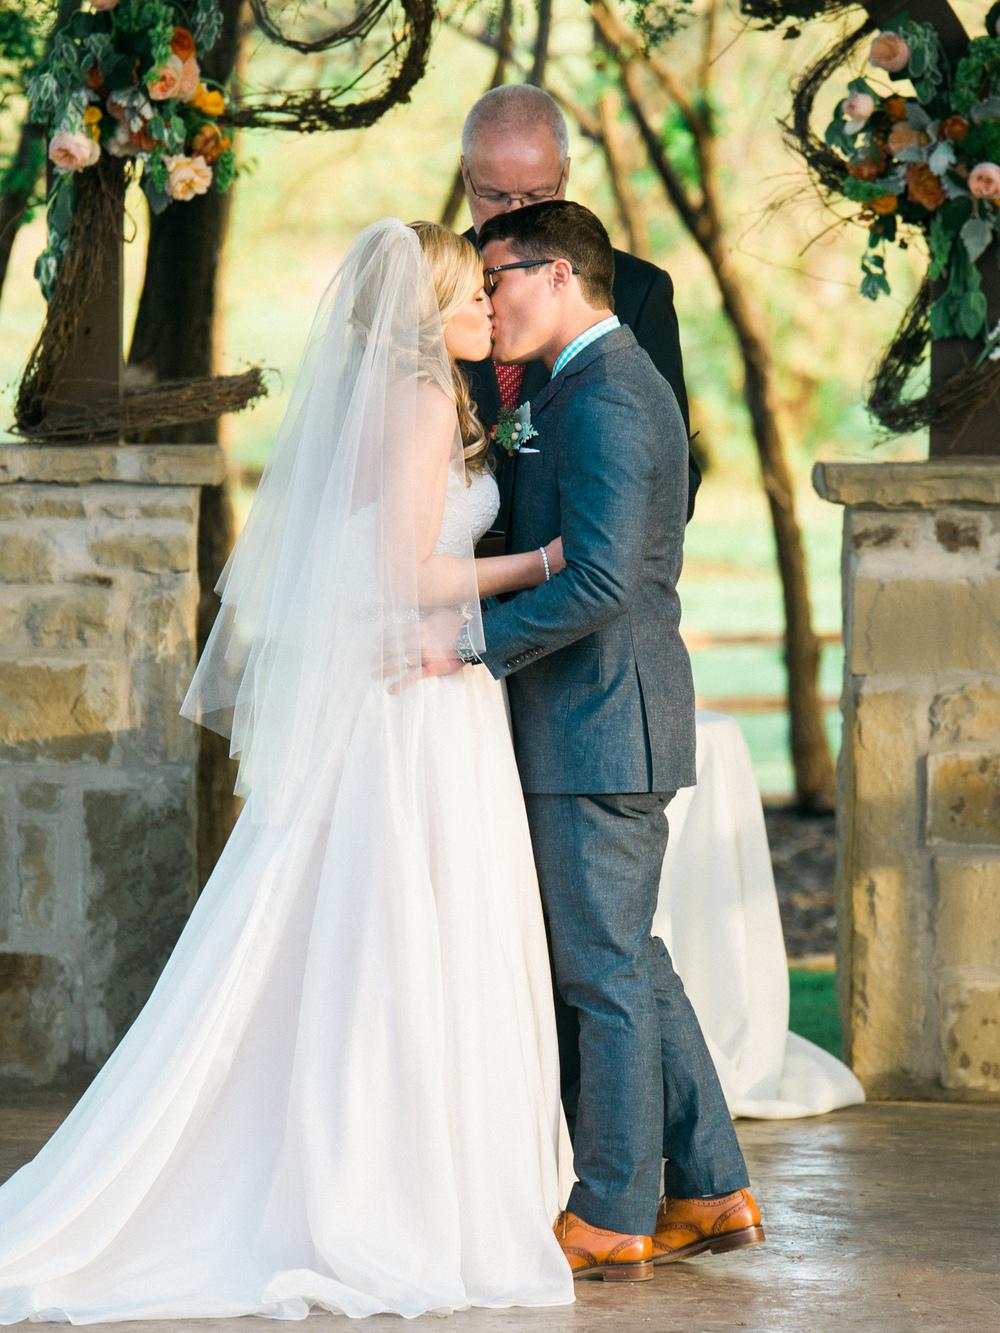 Chisolm_Springs_Wedding_OKC_Film_photographer-14.jpg